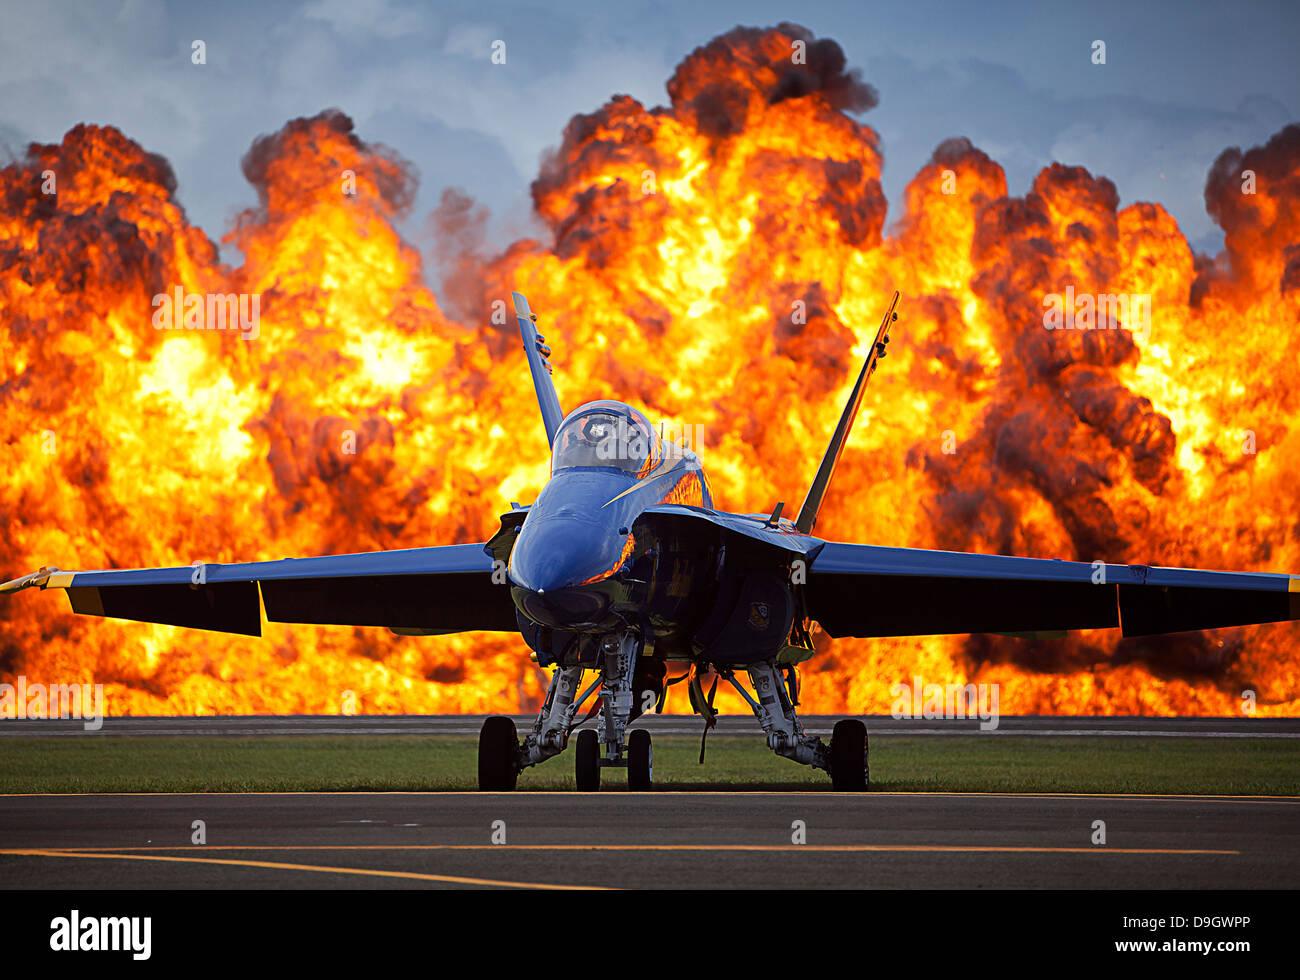 A wall of fire erupts behind a U.S. Navy F/A-18 Hornet aircraft. - Stock Image